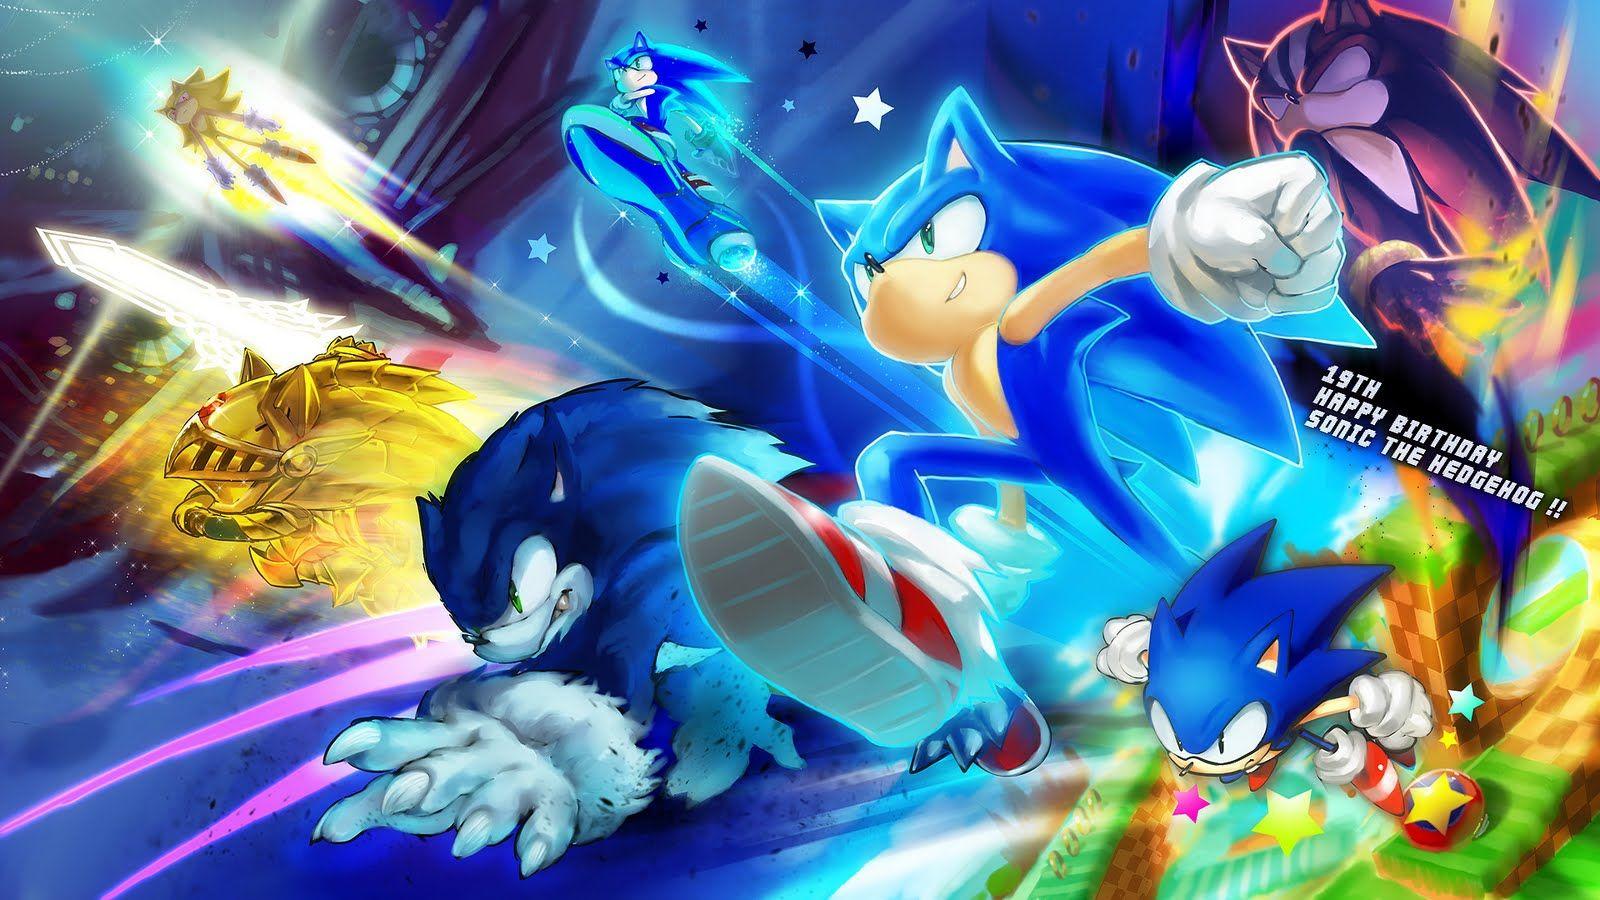 Shadow Vs Metal Sonic Storm Games Maio 2011 Sonic First Fandom